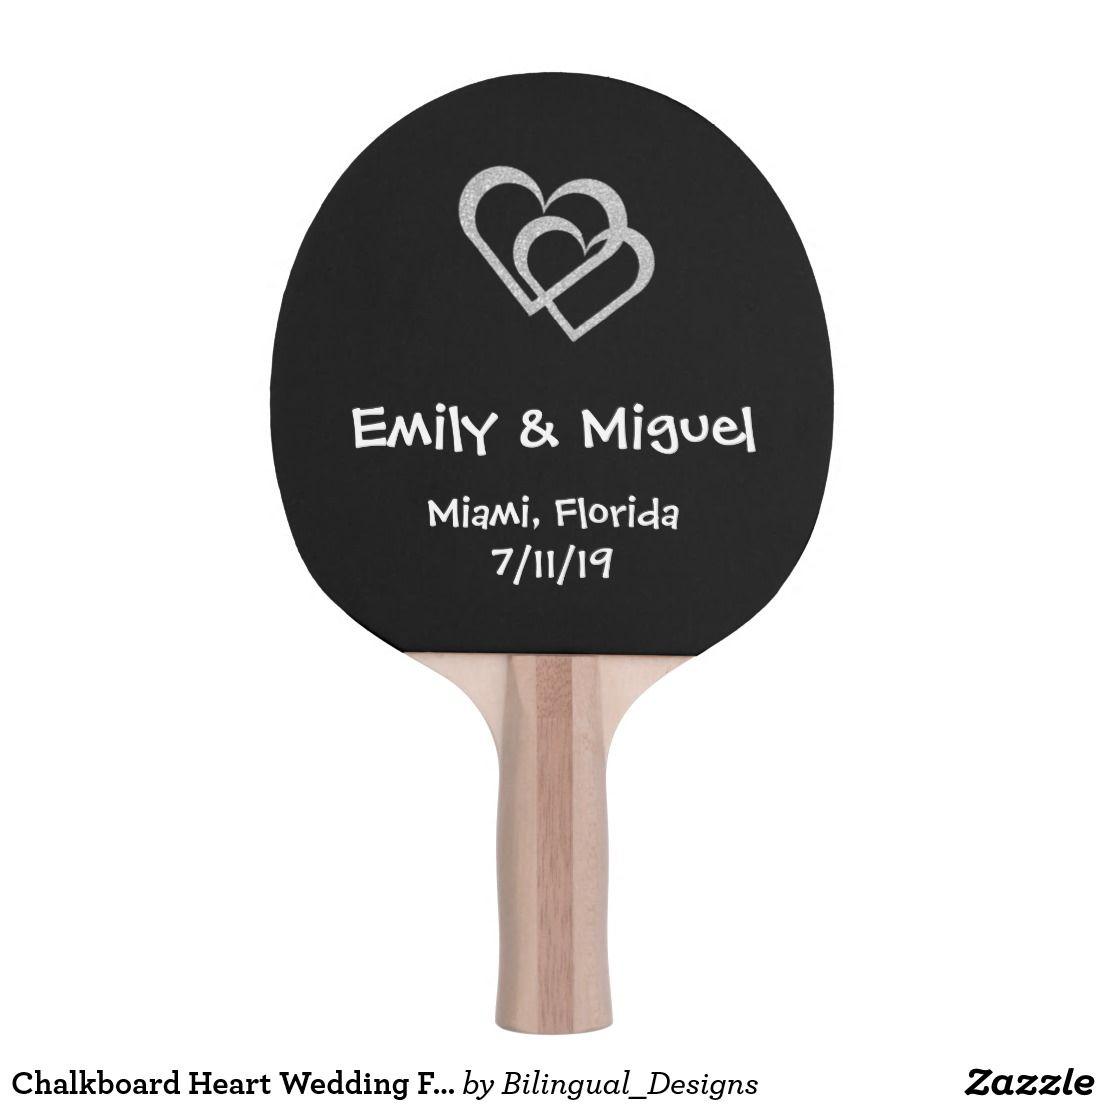 Chalkboard Heart Wedding Favor Table Tennis Bat Ping Pong Paddle ...